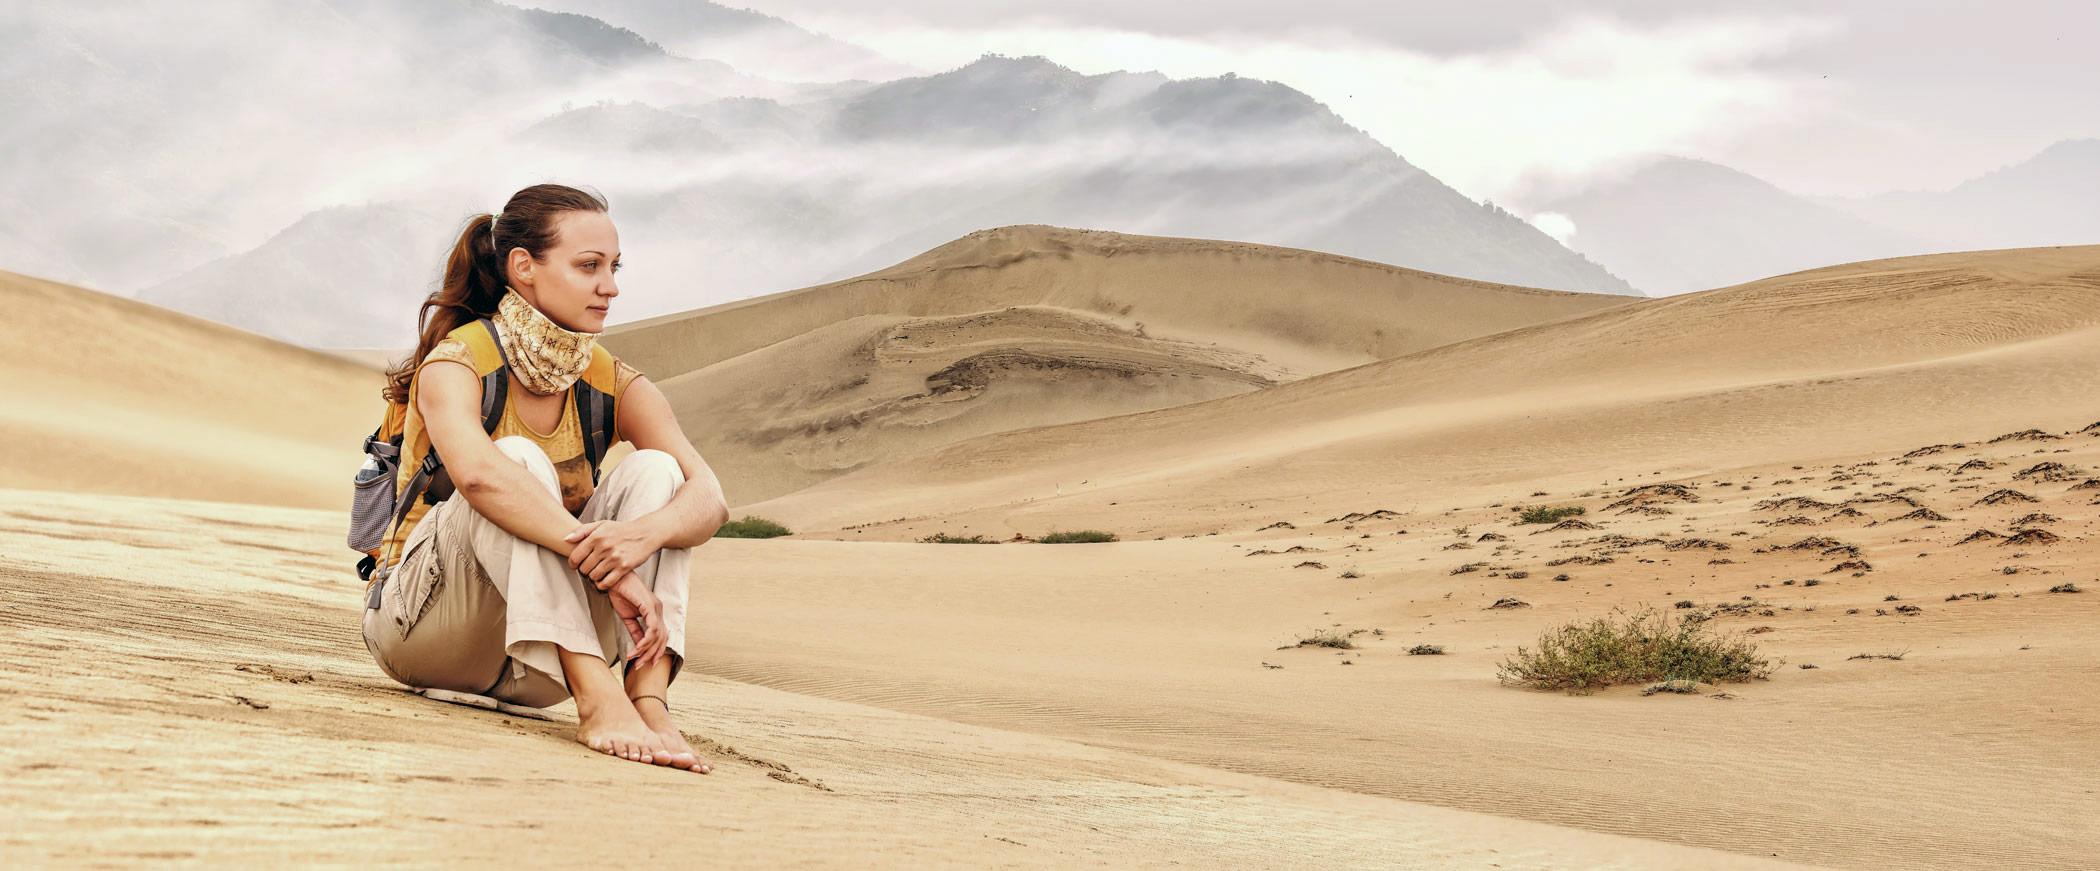 mujer-desierto-def-1